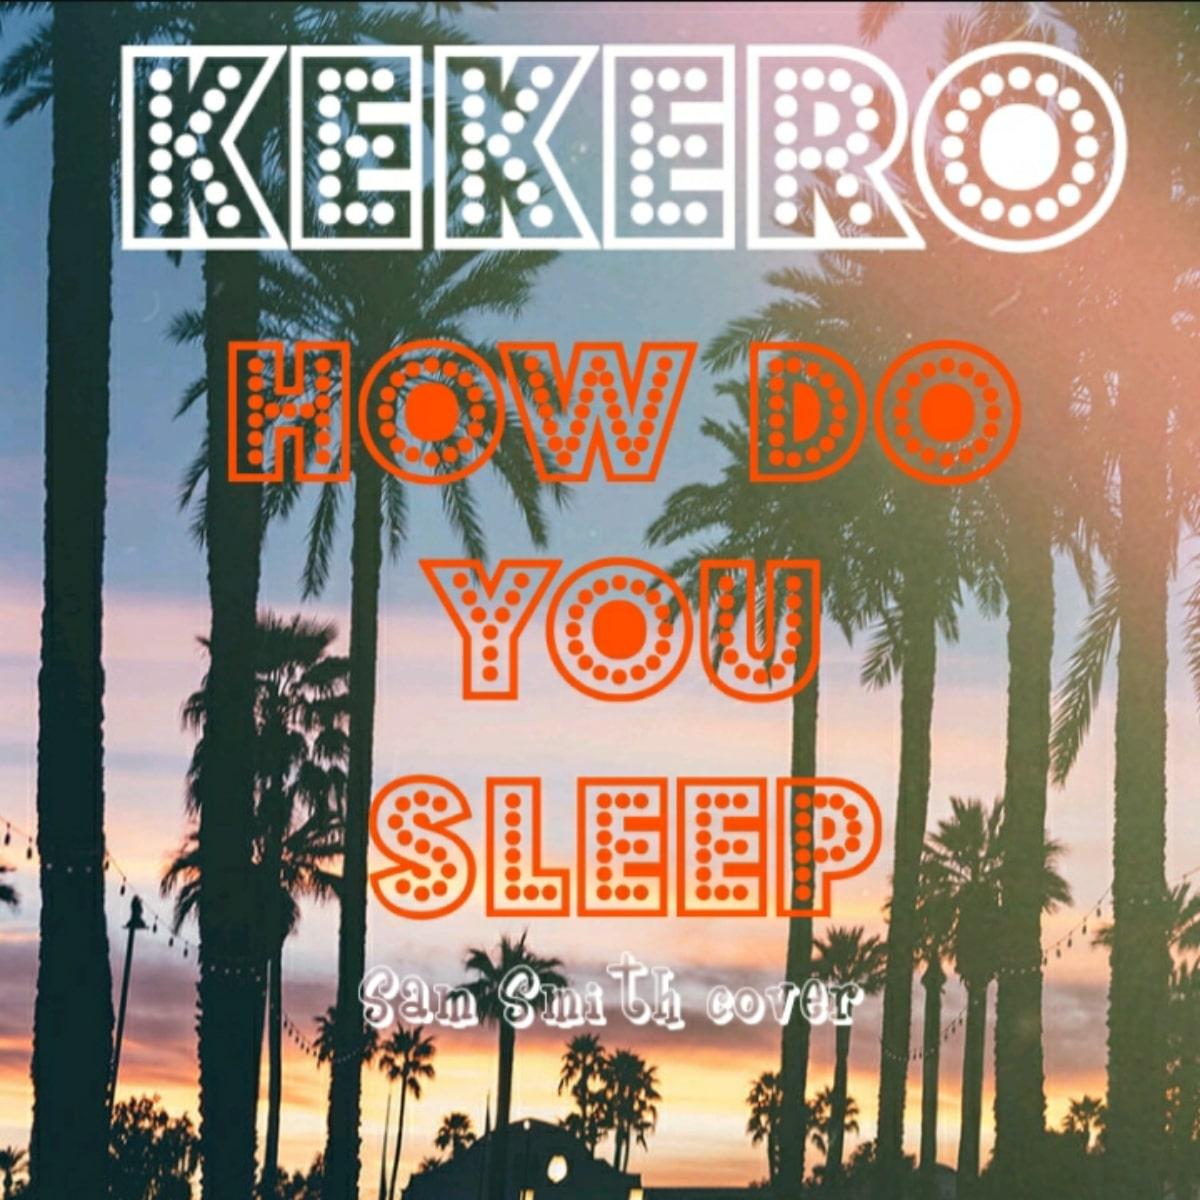 Kekero How Do You Sleep Sam Smith Acoustic Cover